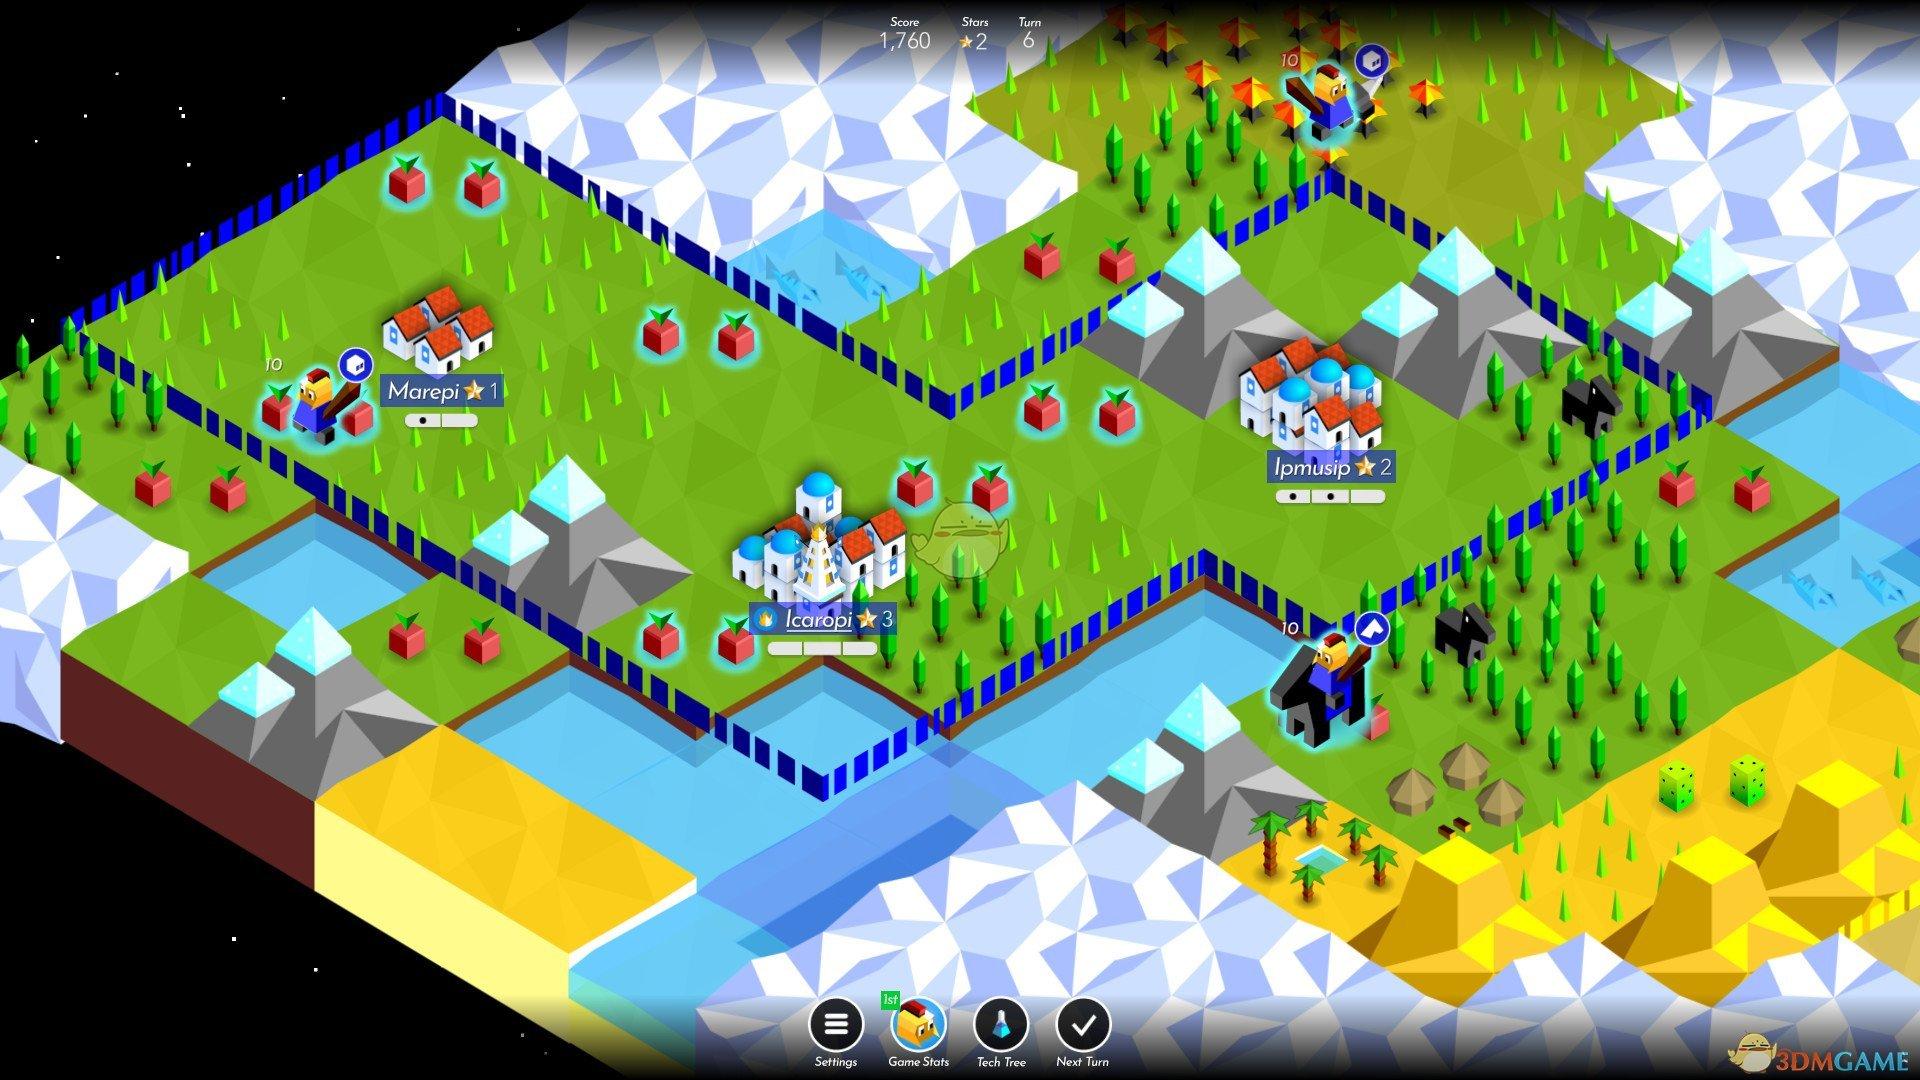 《The Battle of Polytopia》游戏配置要求一览